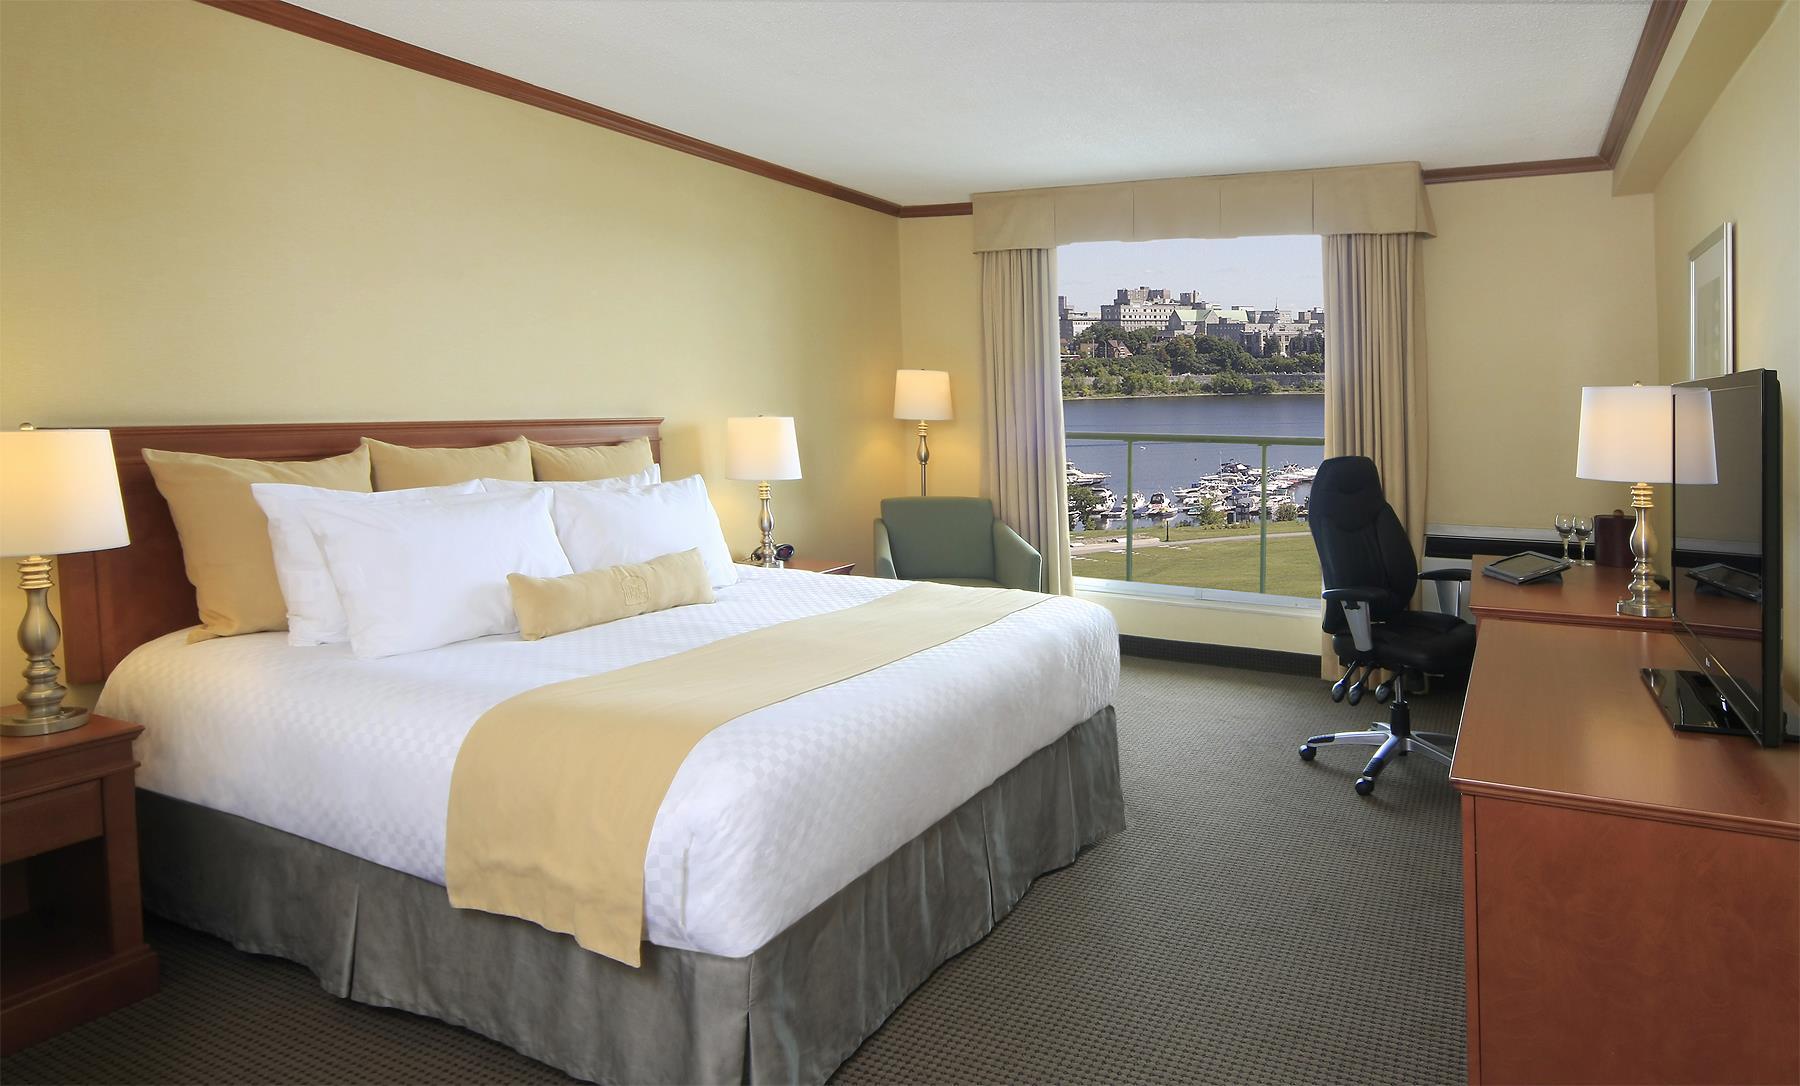 Best Western Plus Gatineau-Ottawa à Gatineau: King Bed Guest Room River View